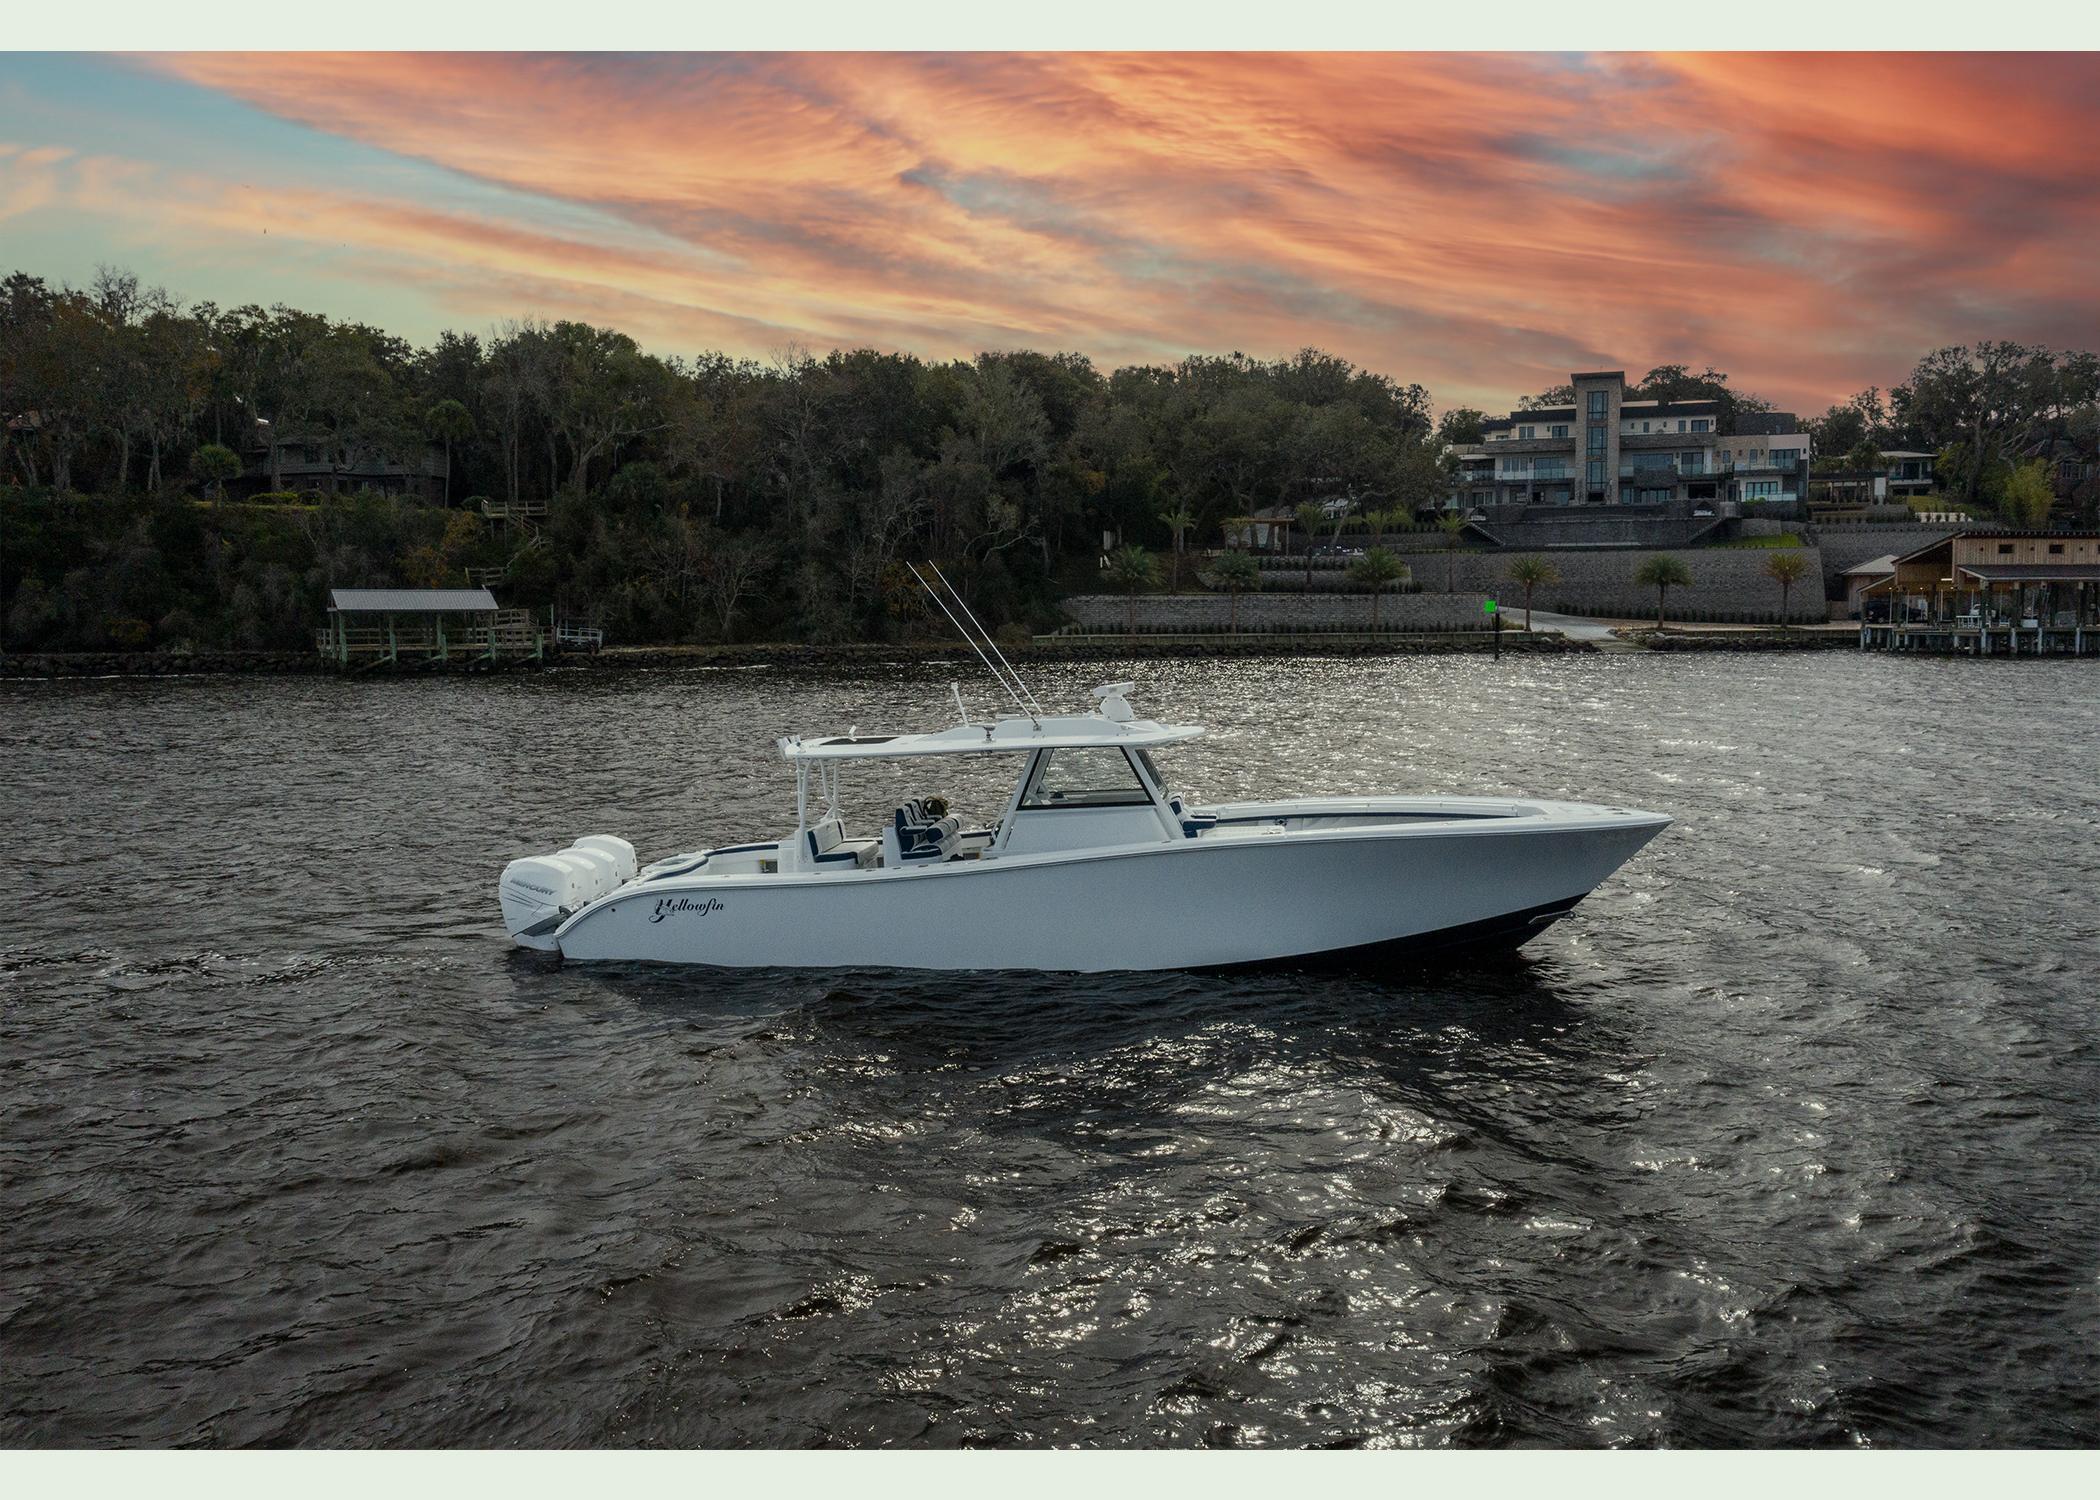 2020 42 Yellowfin Offshore - Profile